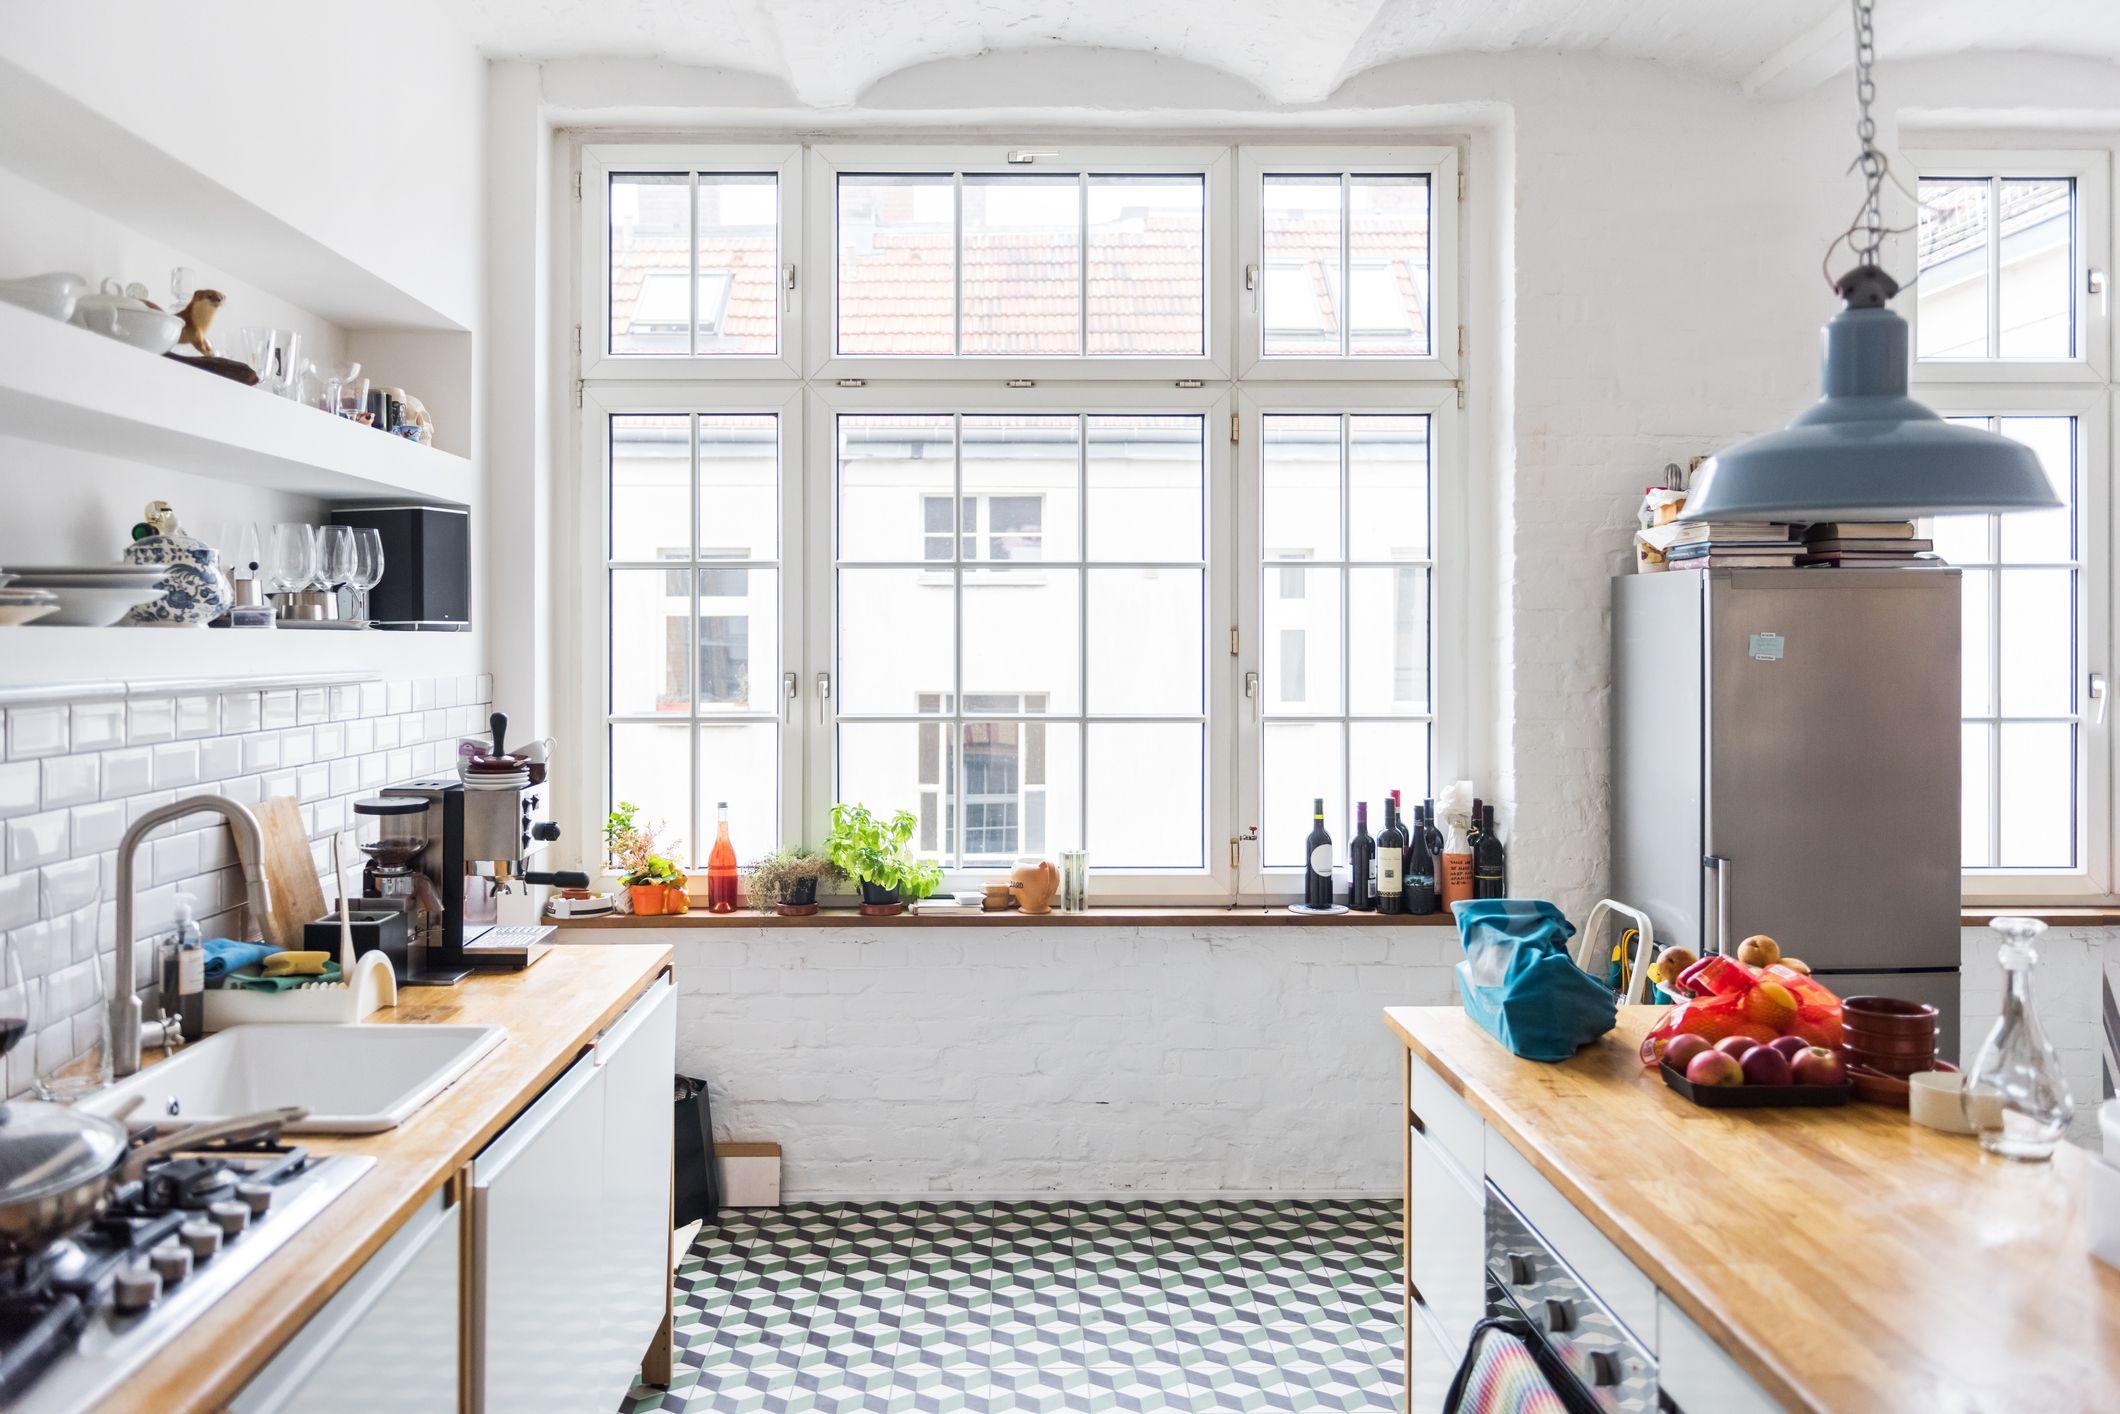 Good Feng Shui Floor Plan Tip 4 - Kitchen Location